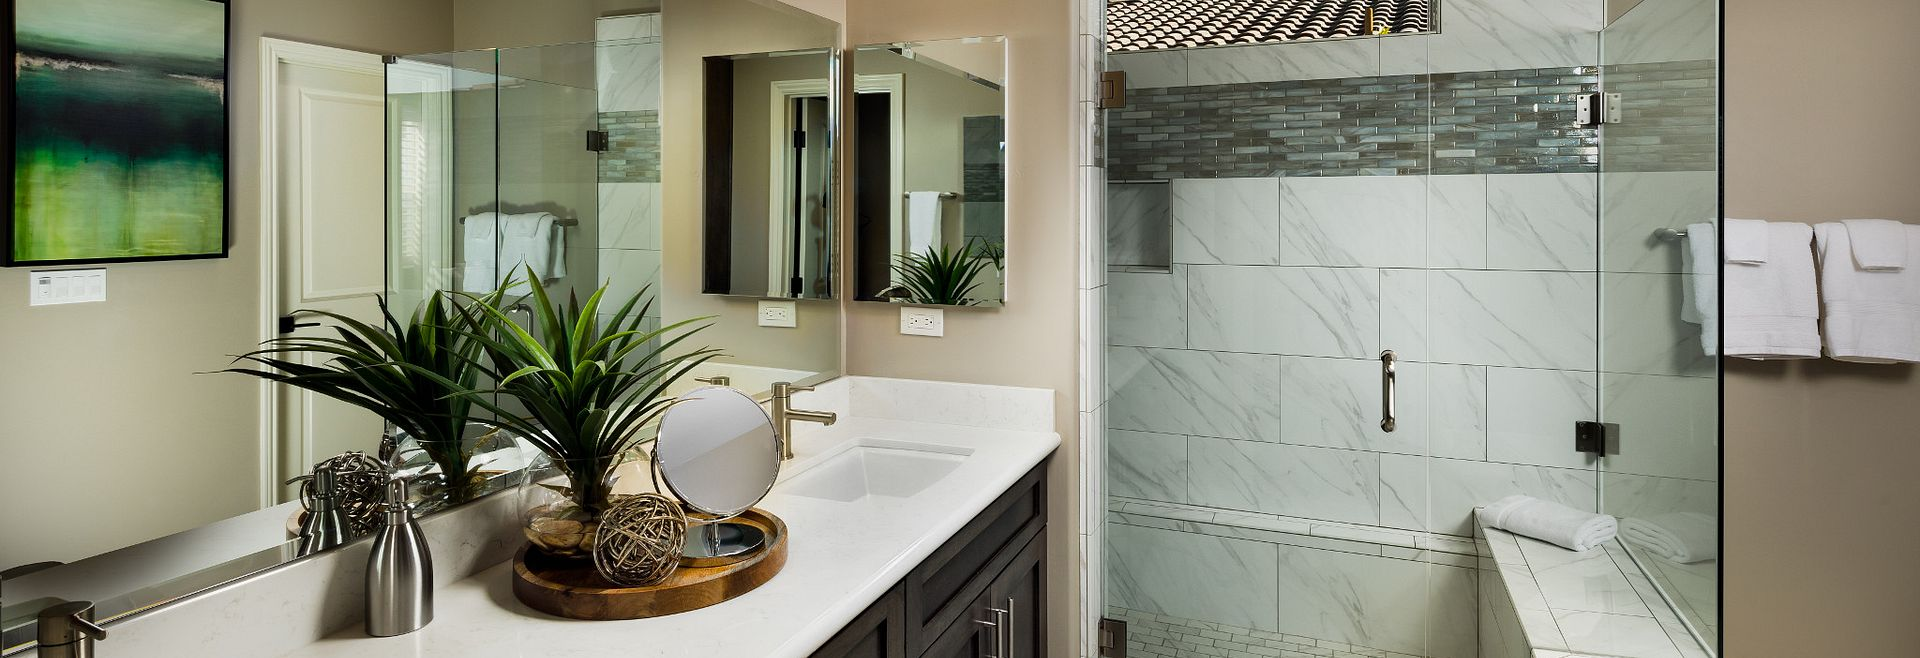 Trilogy Monarch Dunes Ojai Master Bathroom